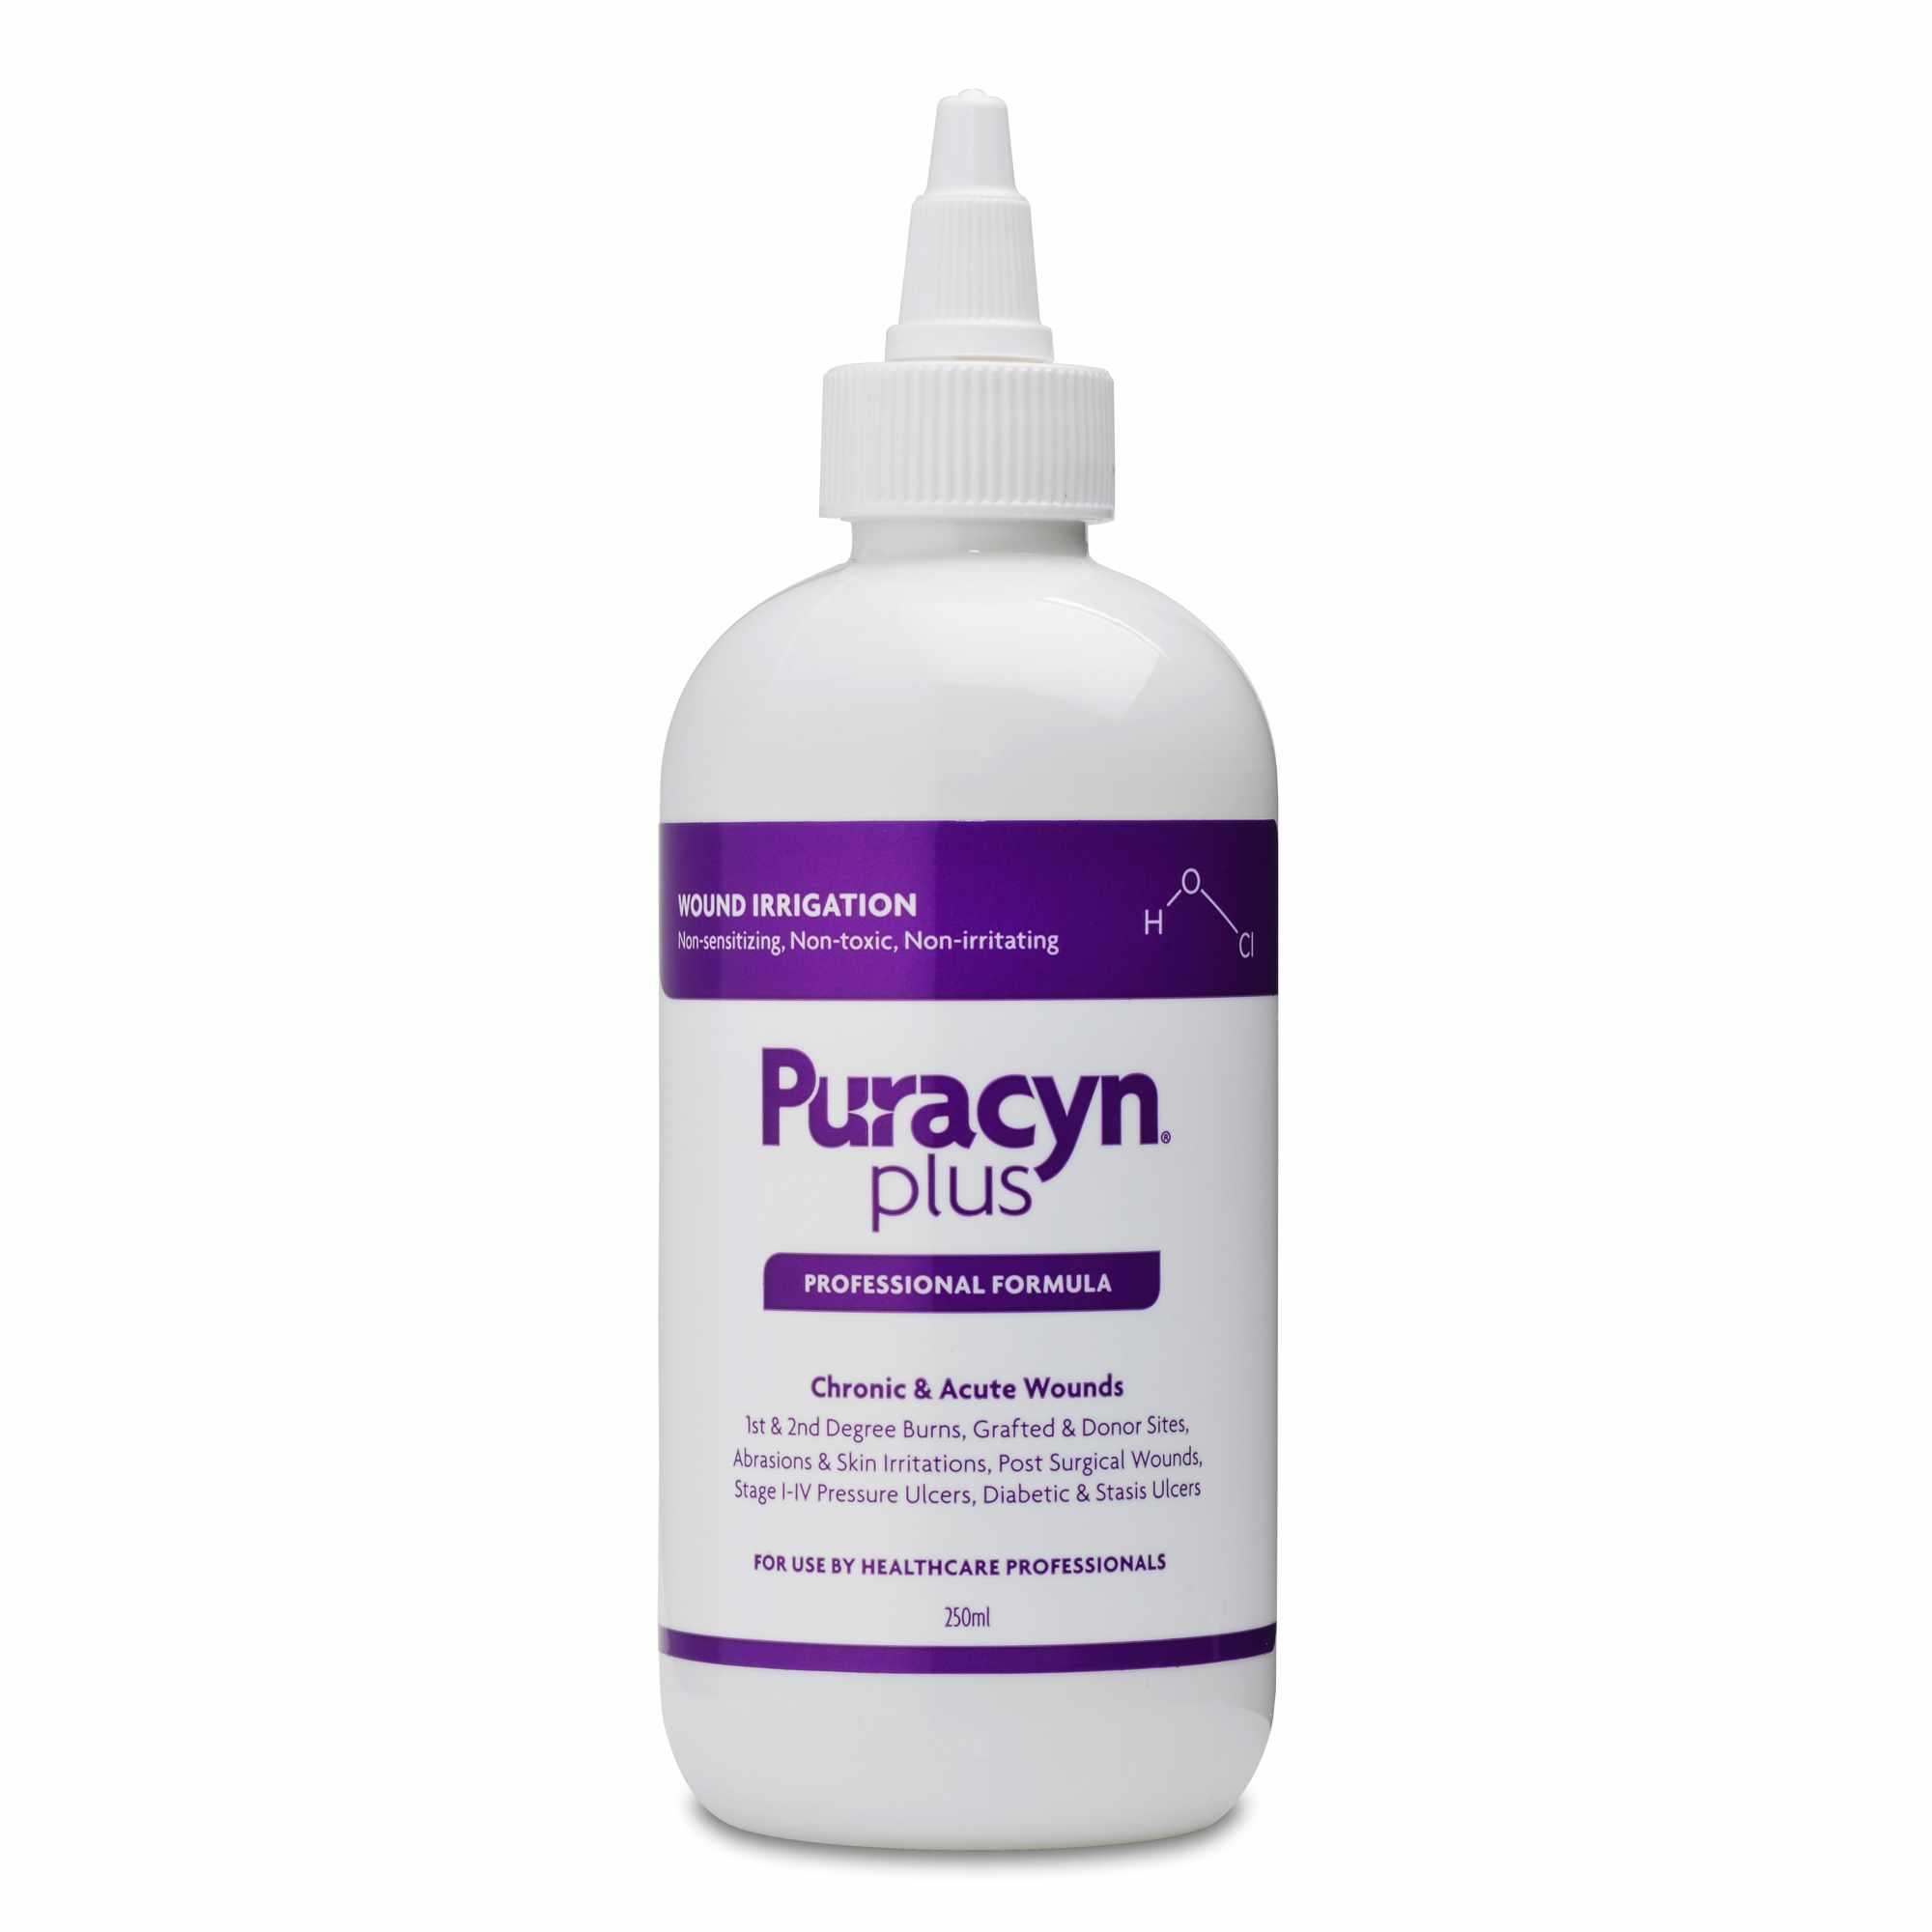 Puracyn Plus Wound Irrigation Solution, Twist Pour Applicator, 250mL